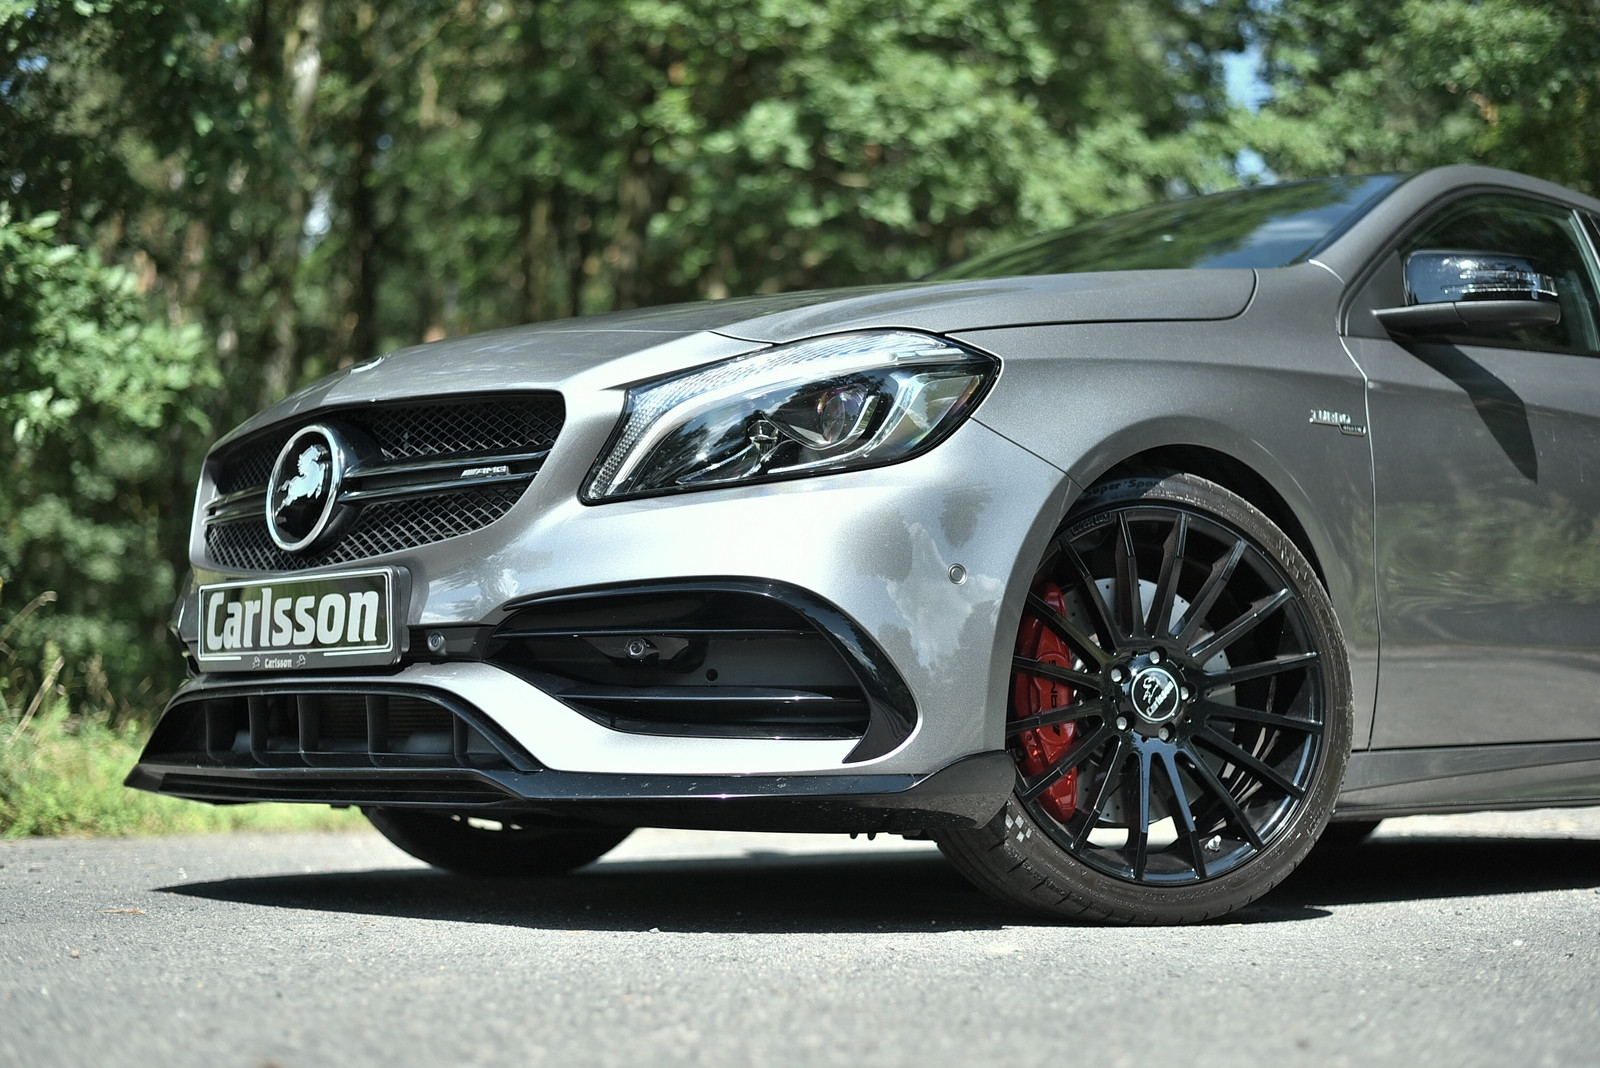 Carlsson Przedni spoiler A W176 Facelift